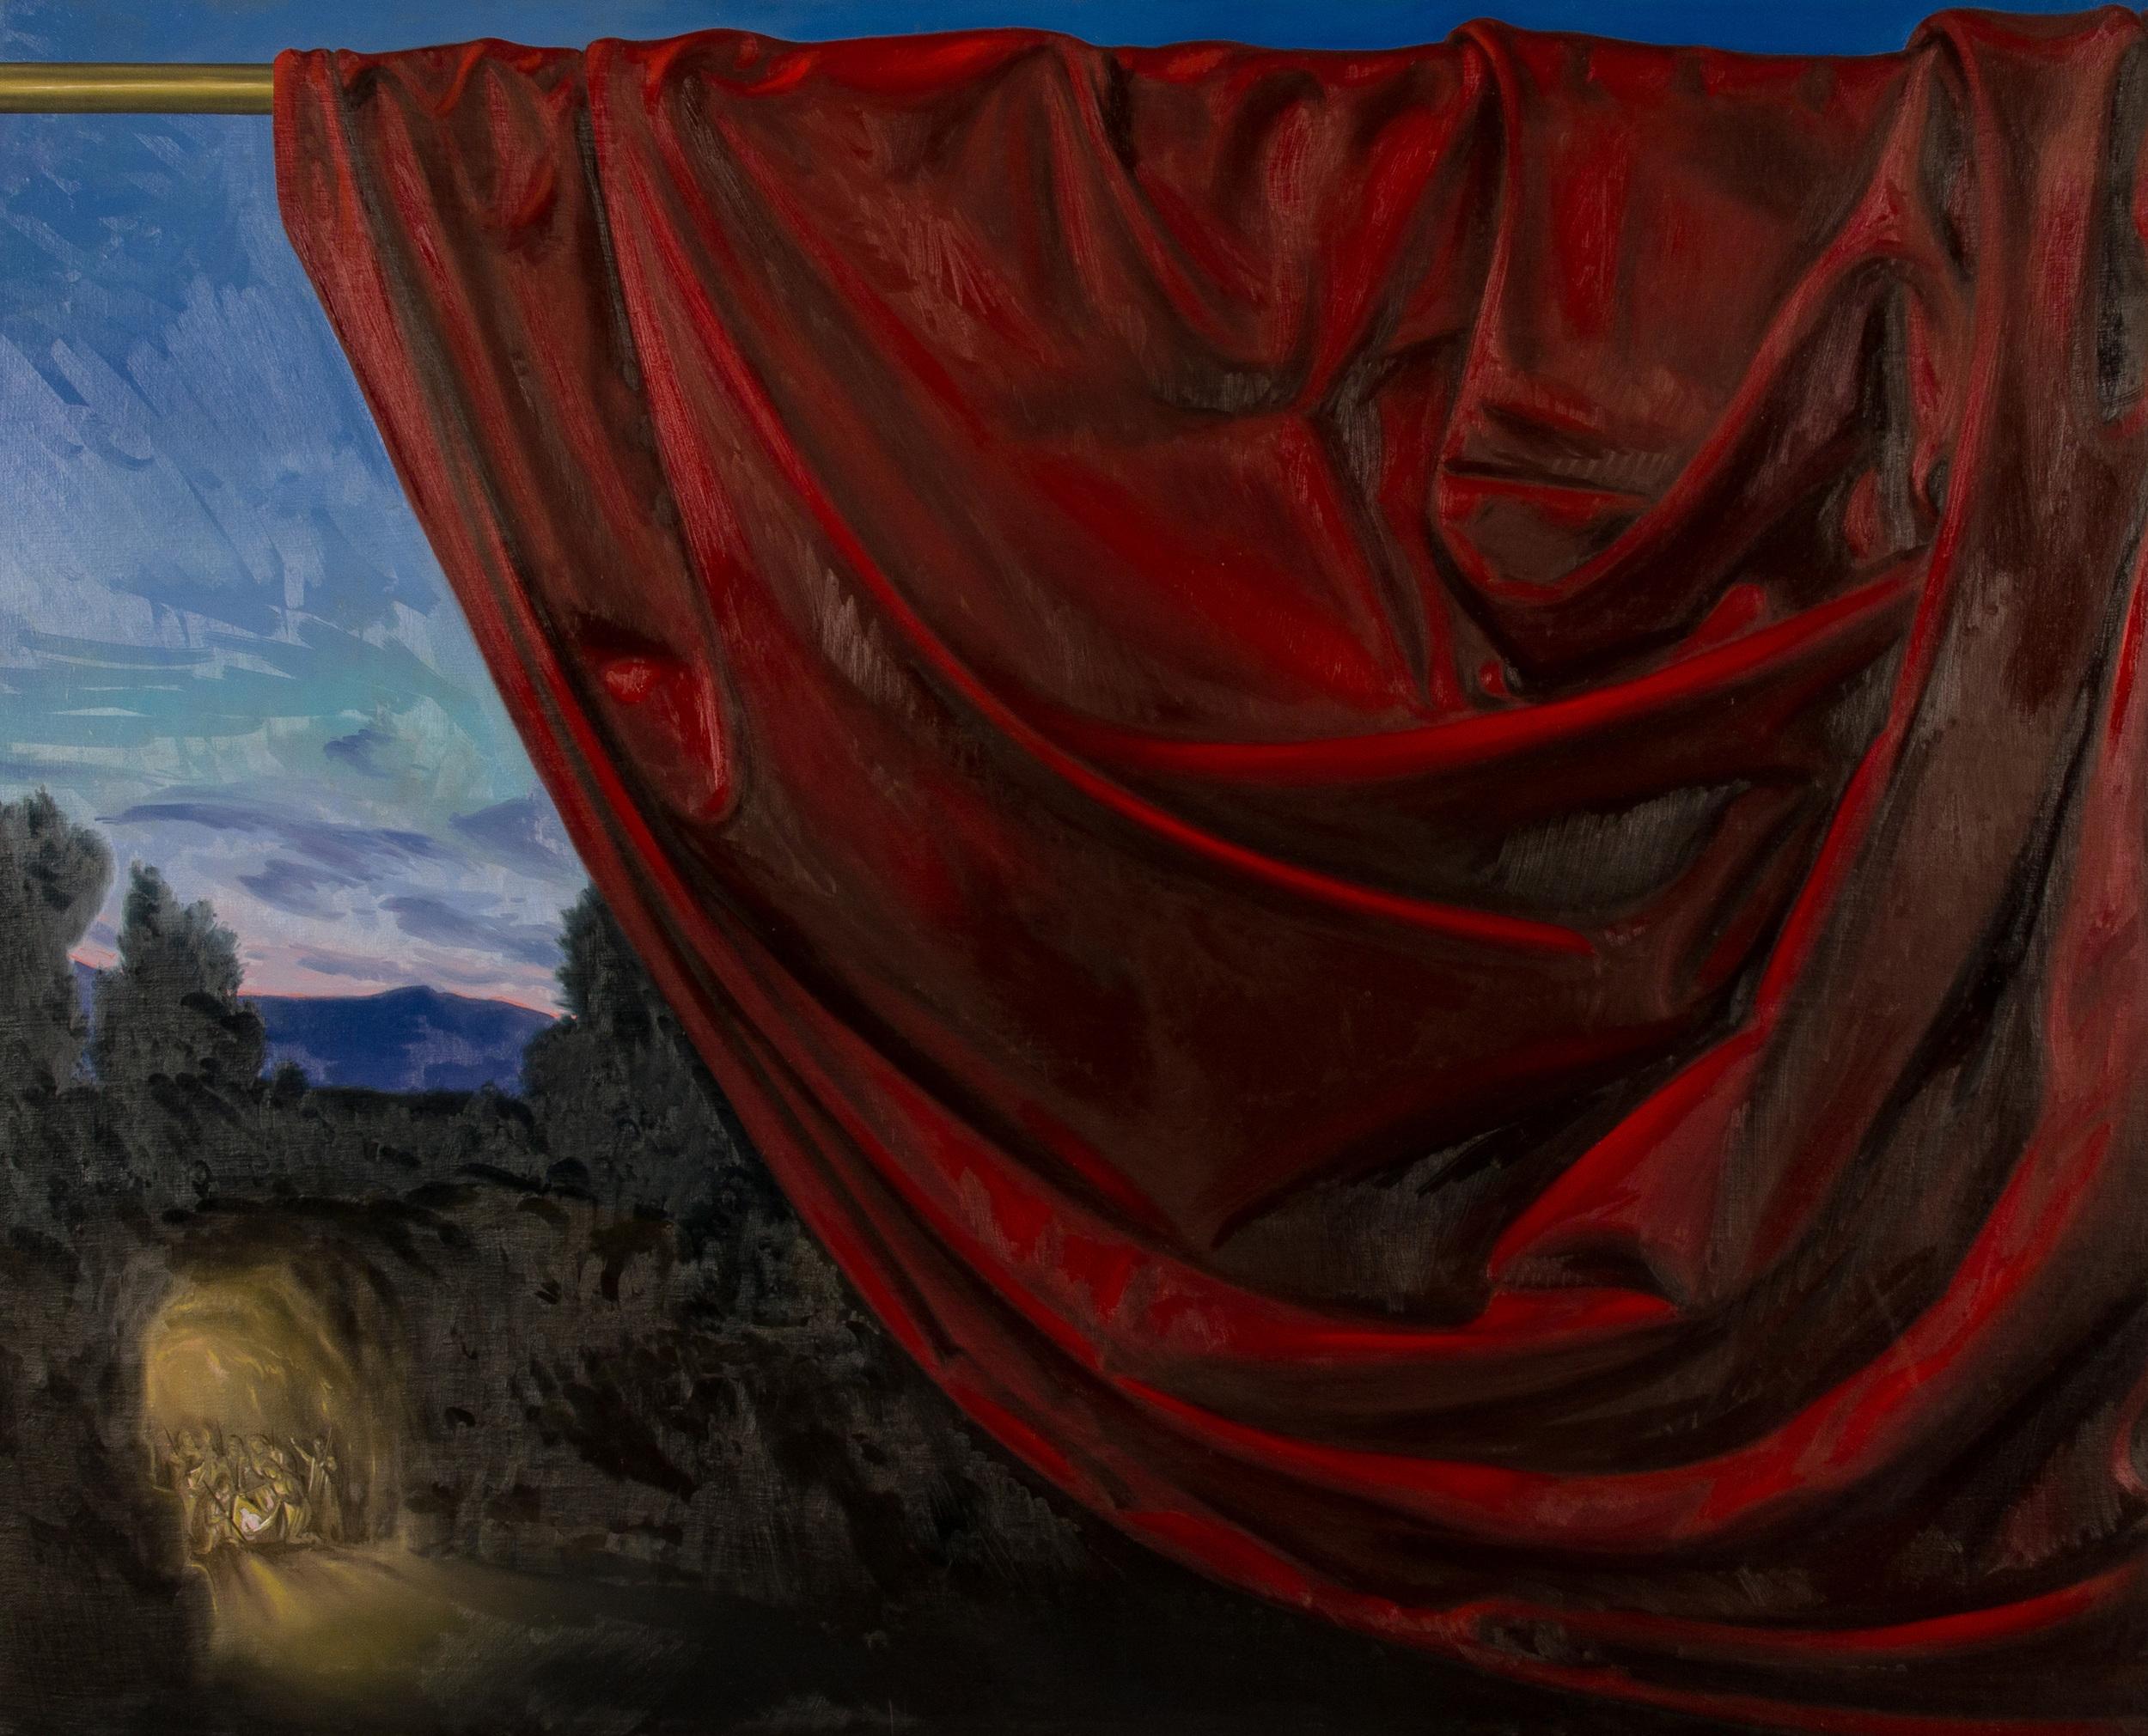 Theophania. Natività , olio su tela, cm 80x100, 2014